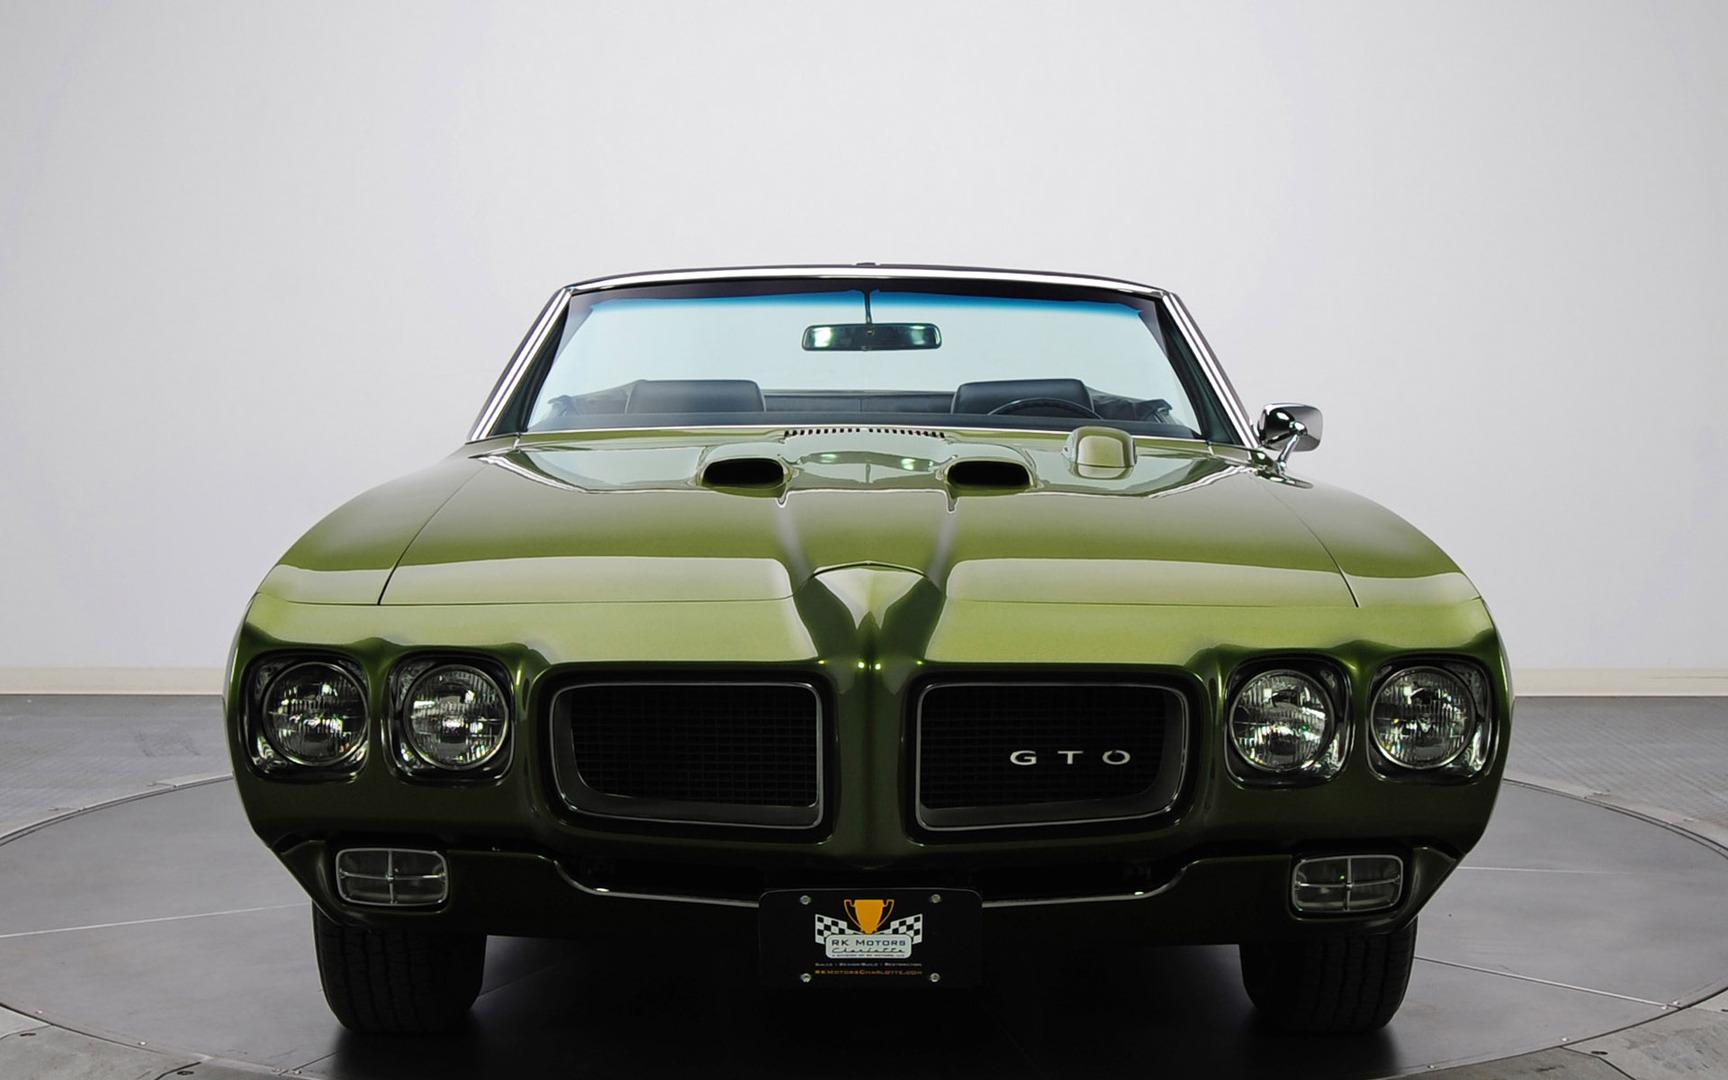 1970 Pontiac GTO Judge wallpaper 19508 1728x1080